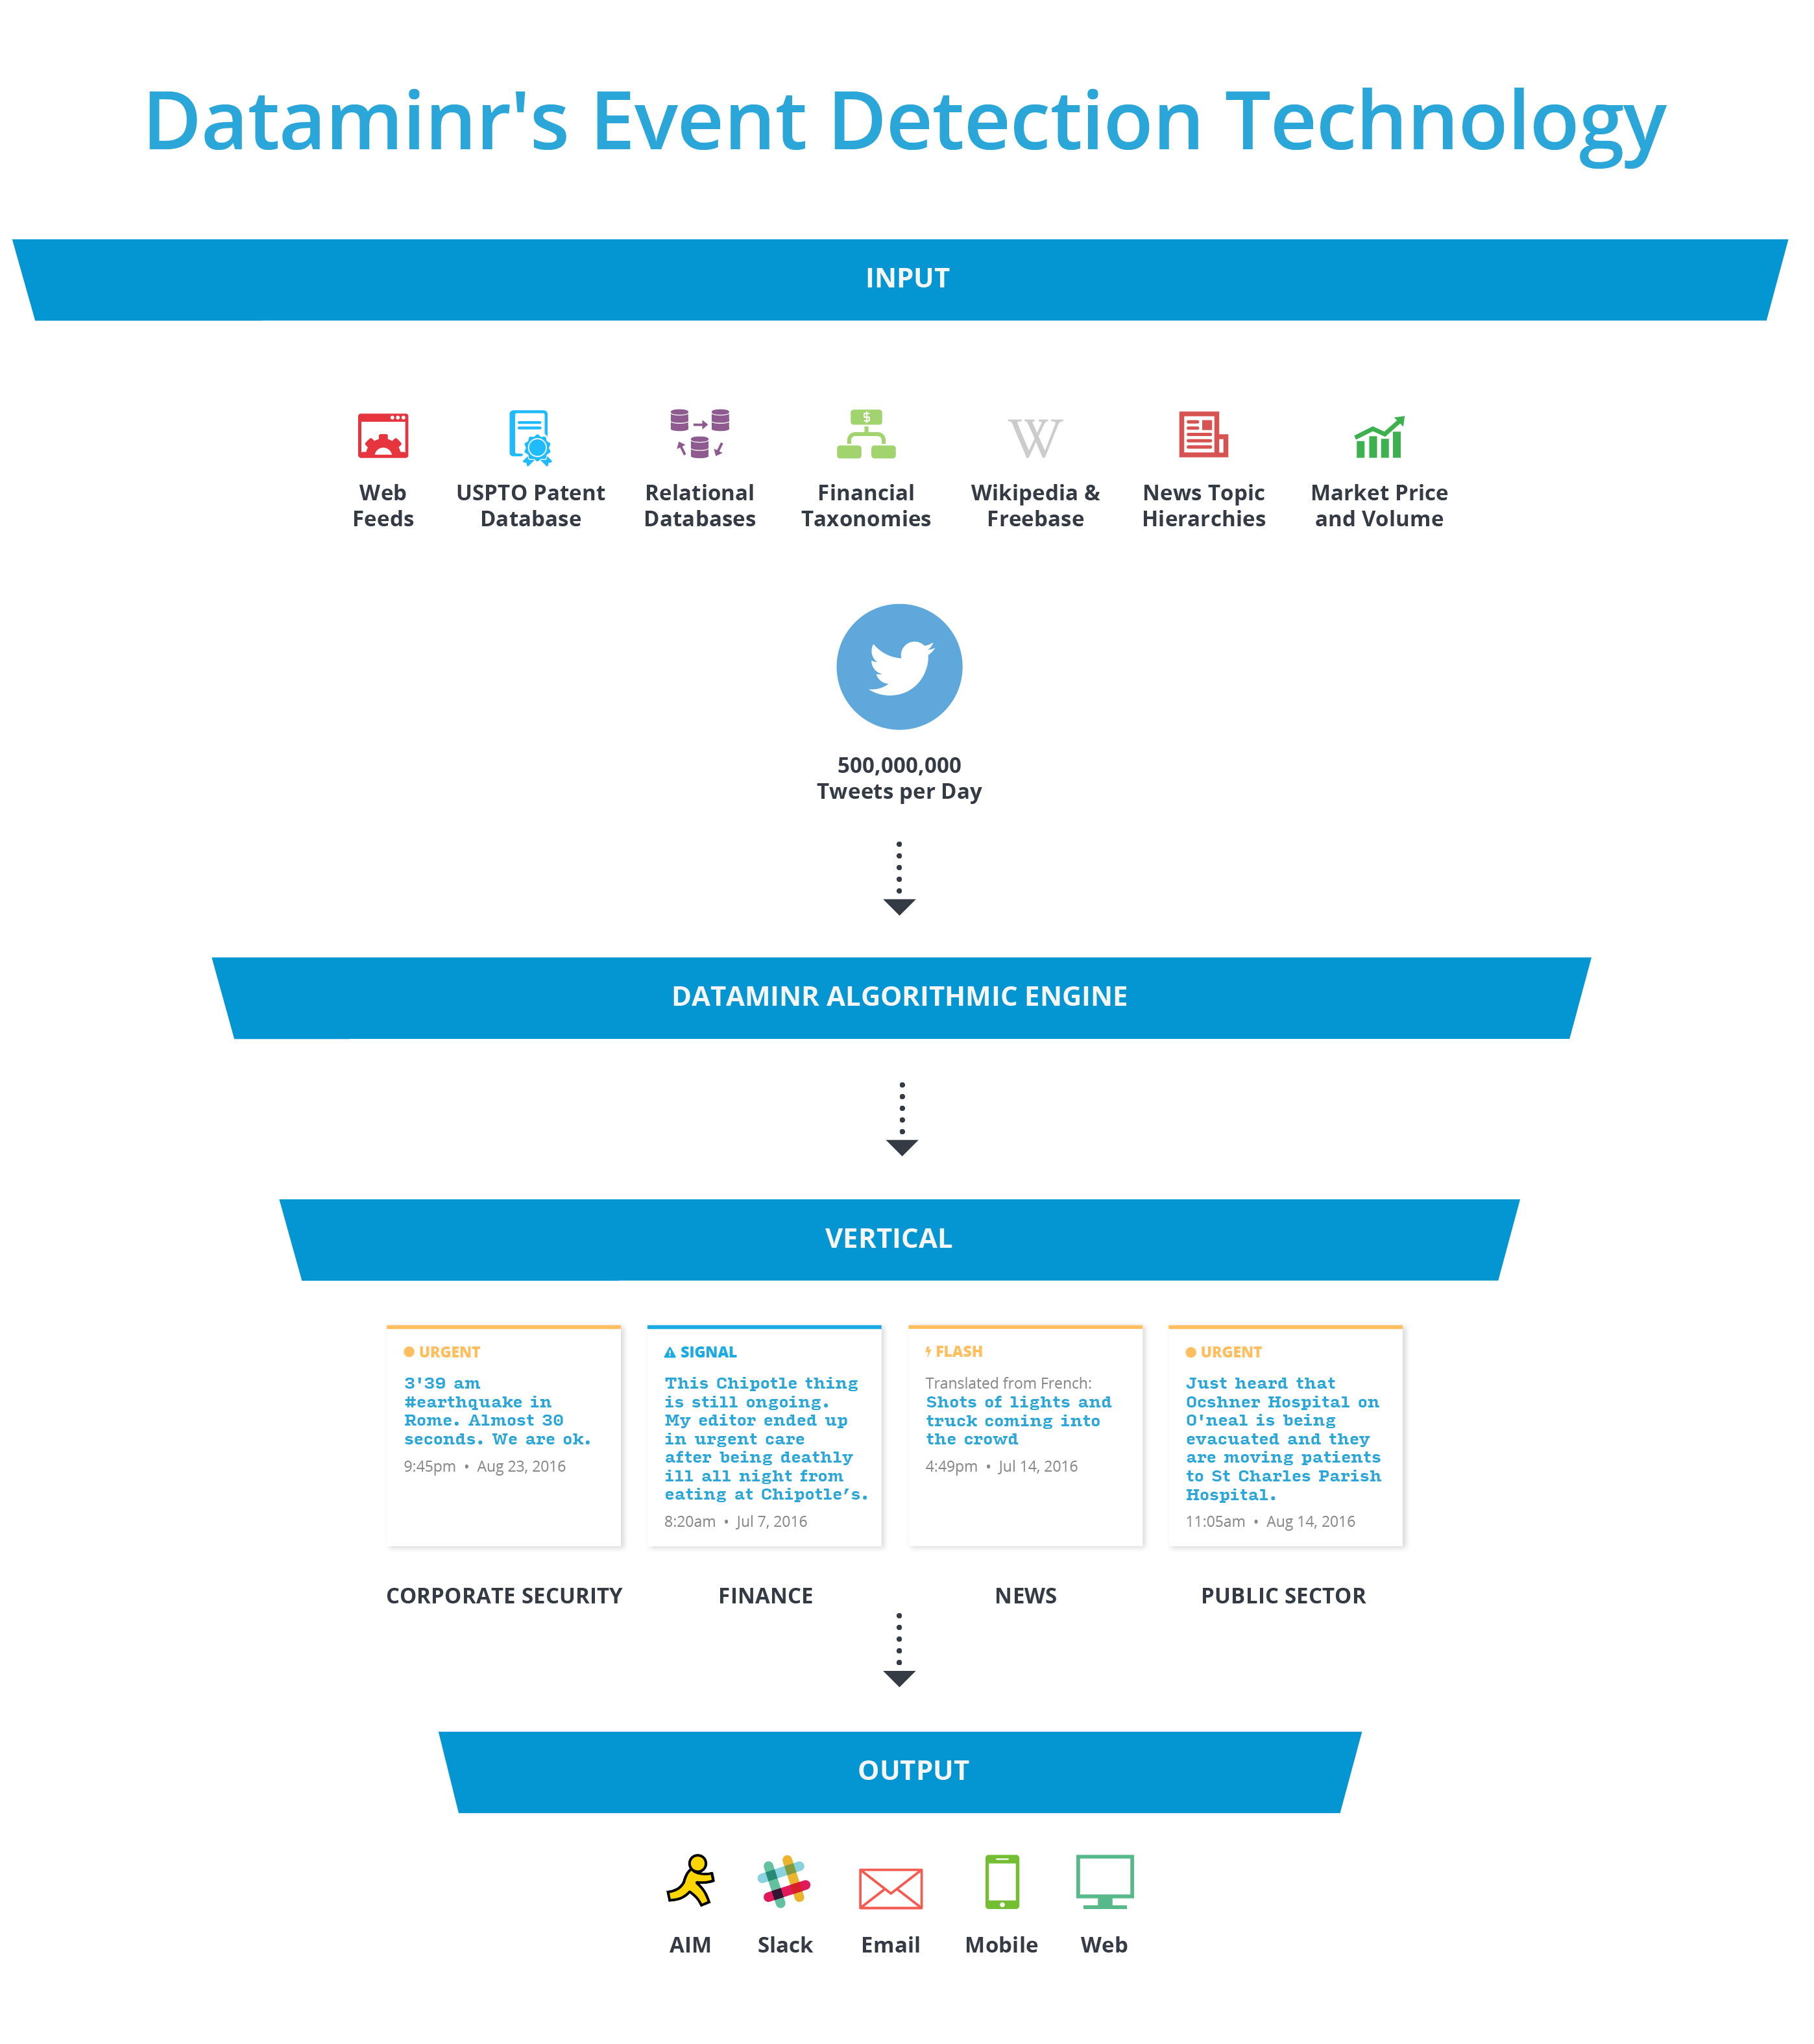 Dataminr Technology